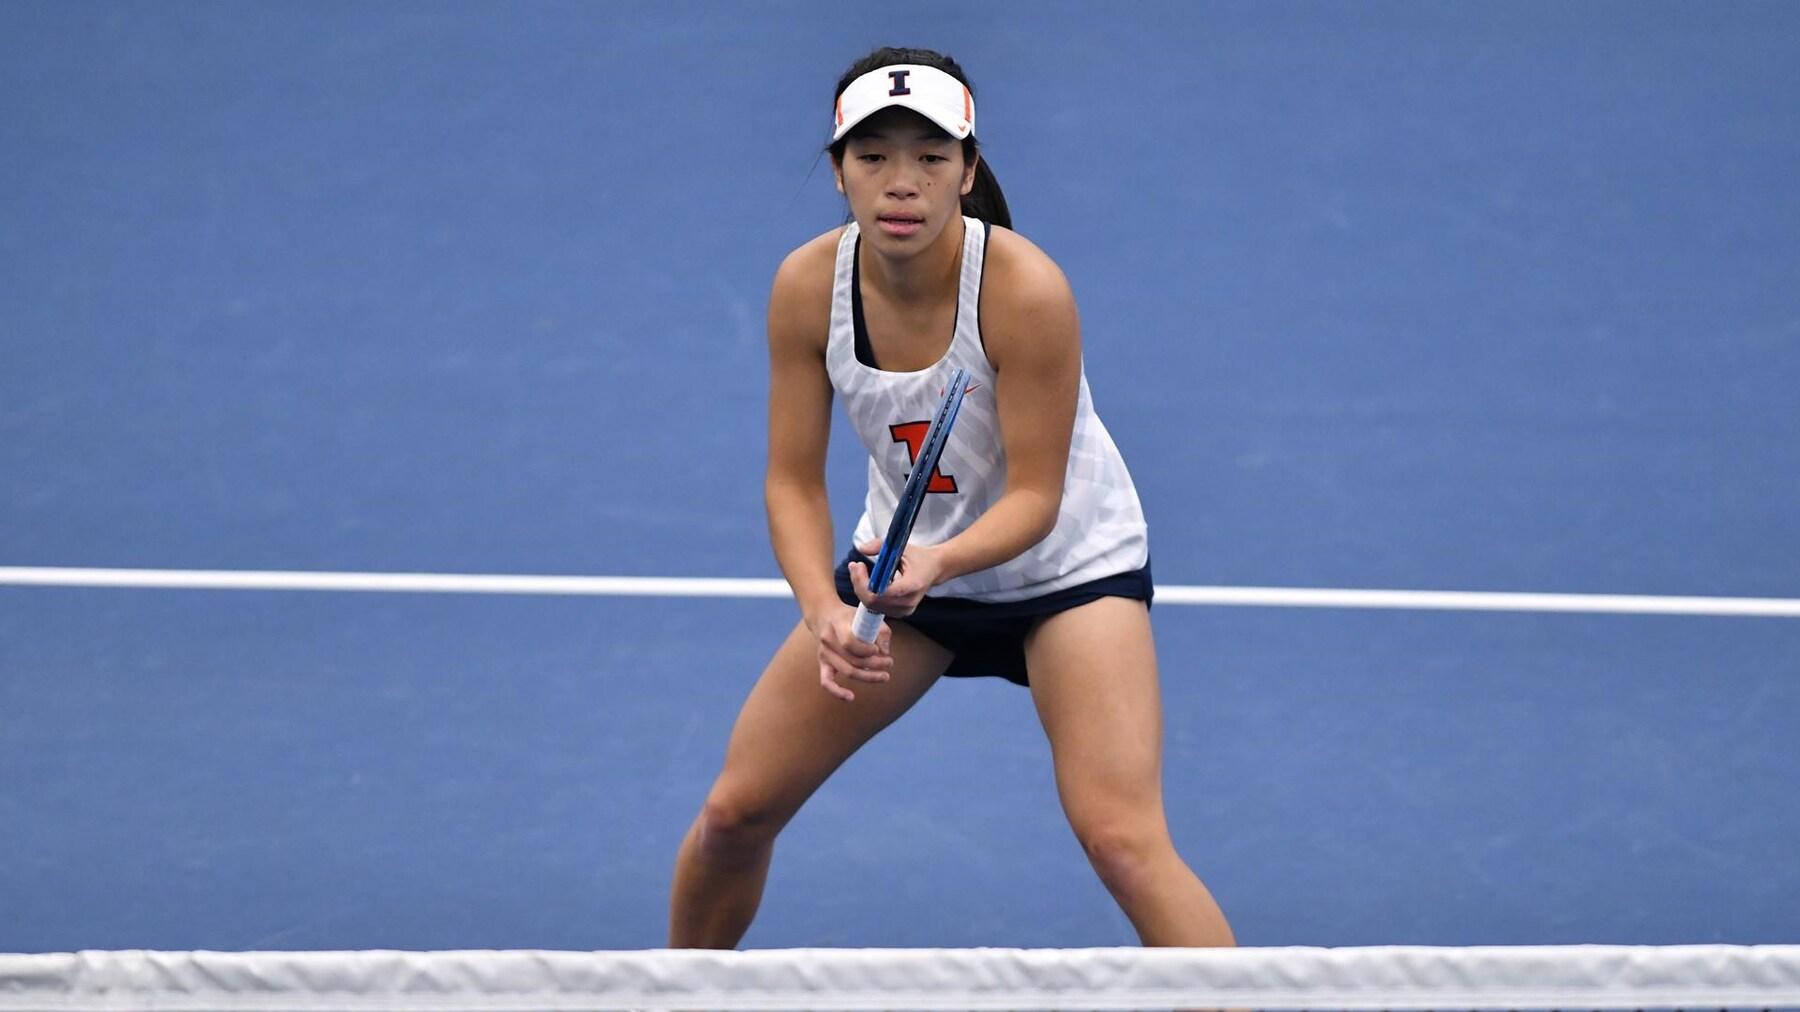 senior Asuka Kawai prepares to return a volley